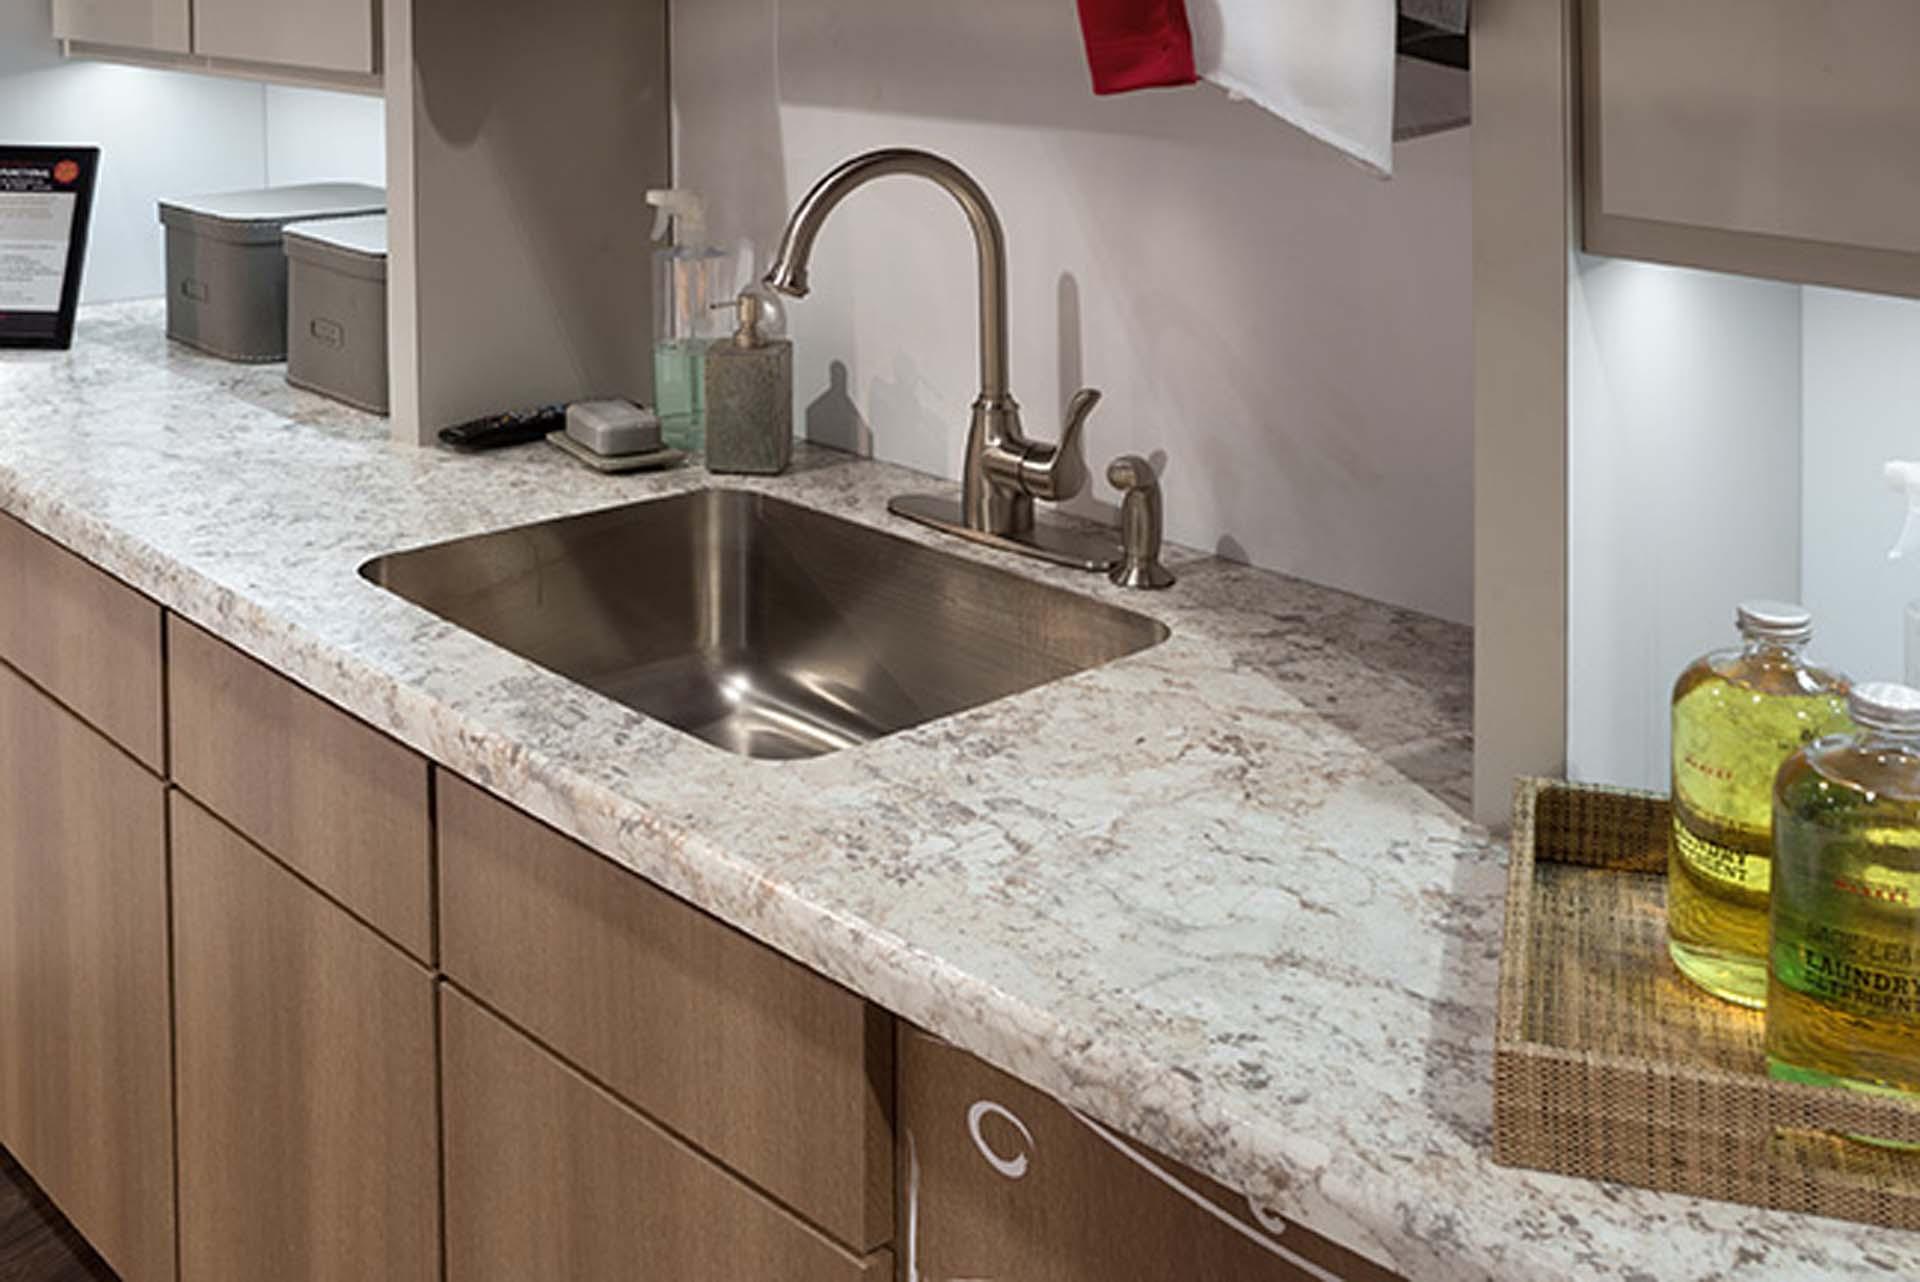 Laminate Counter Kitchen1